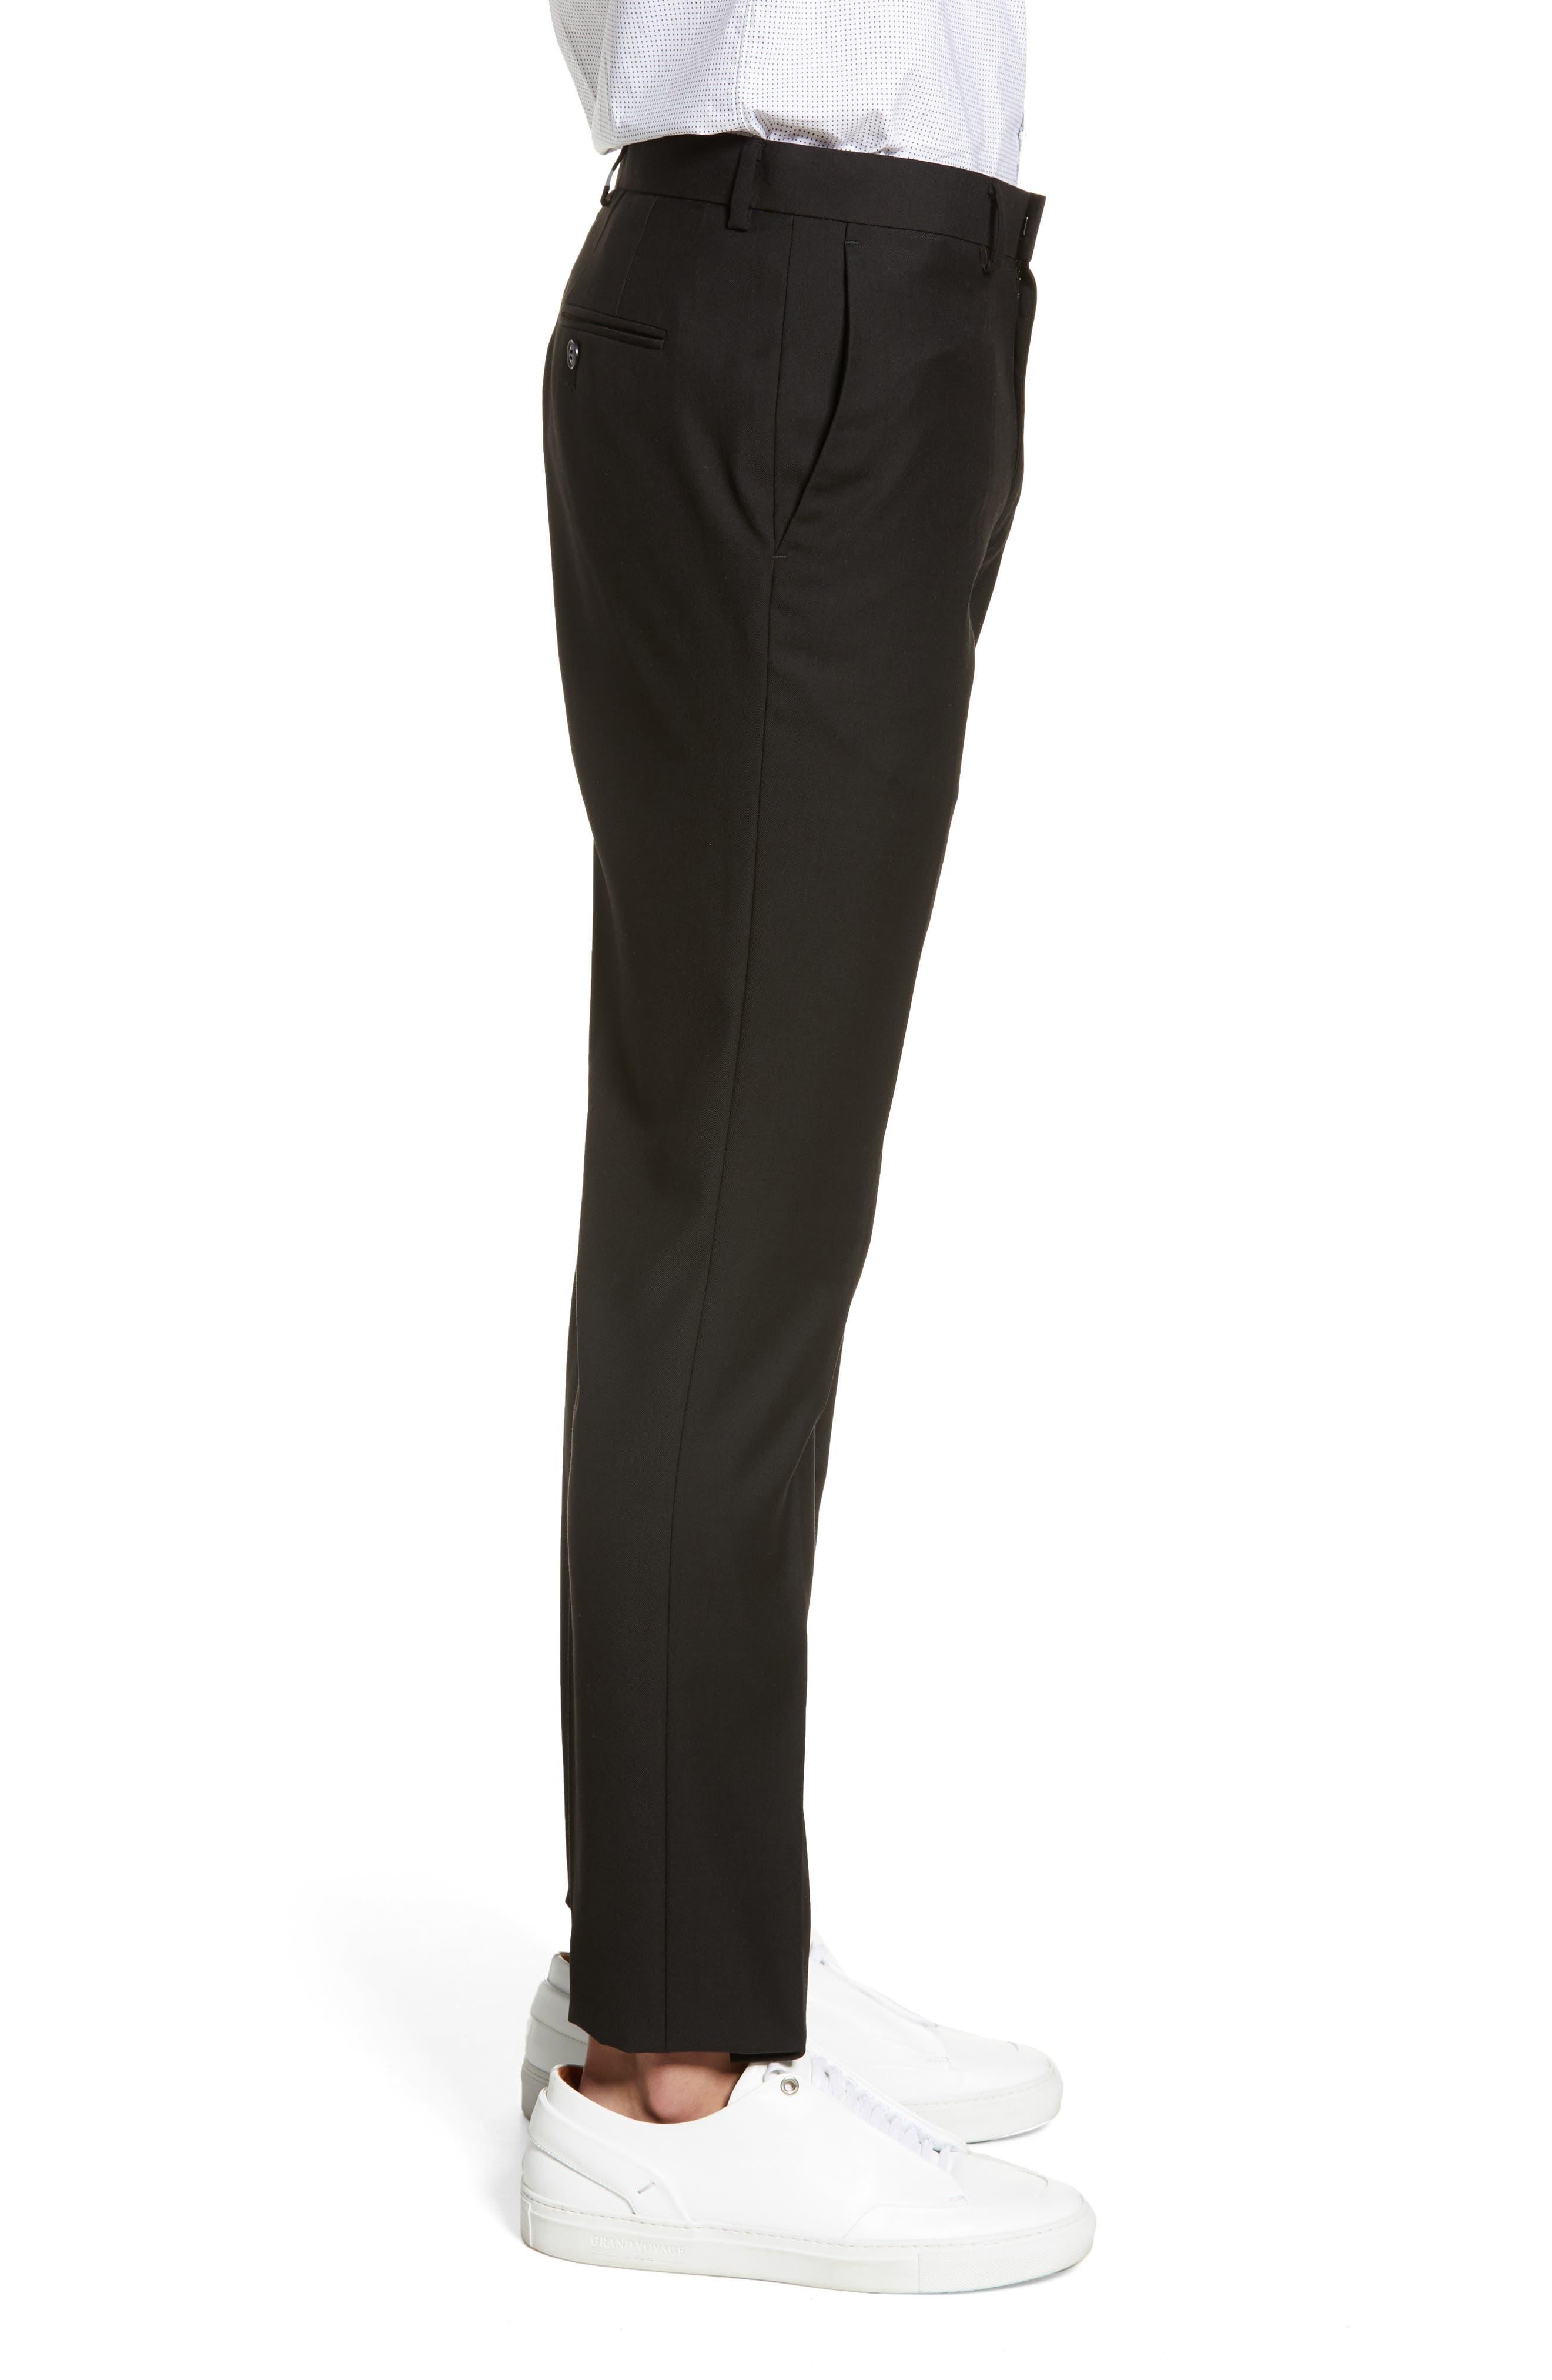 TOPMAN, Black Skinny Fit Trousers, Alternate thumbnail 4, color, BLACK